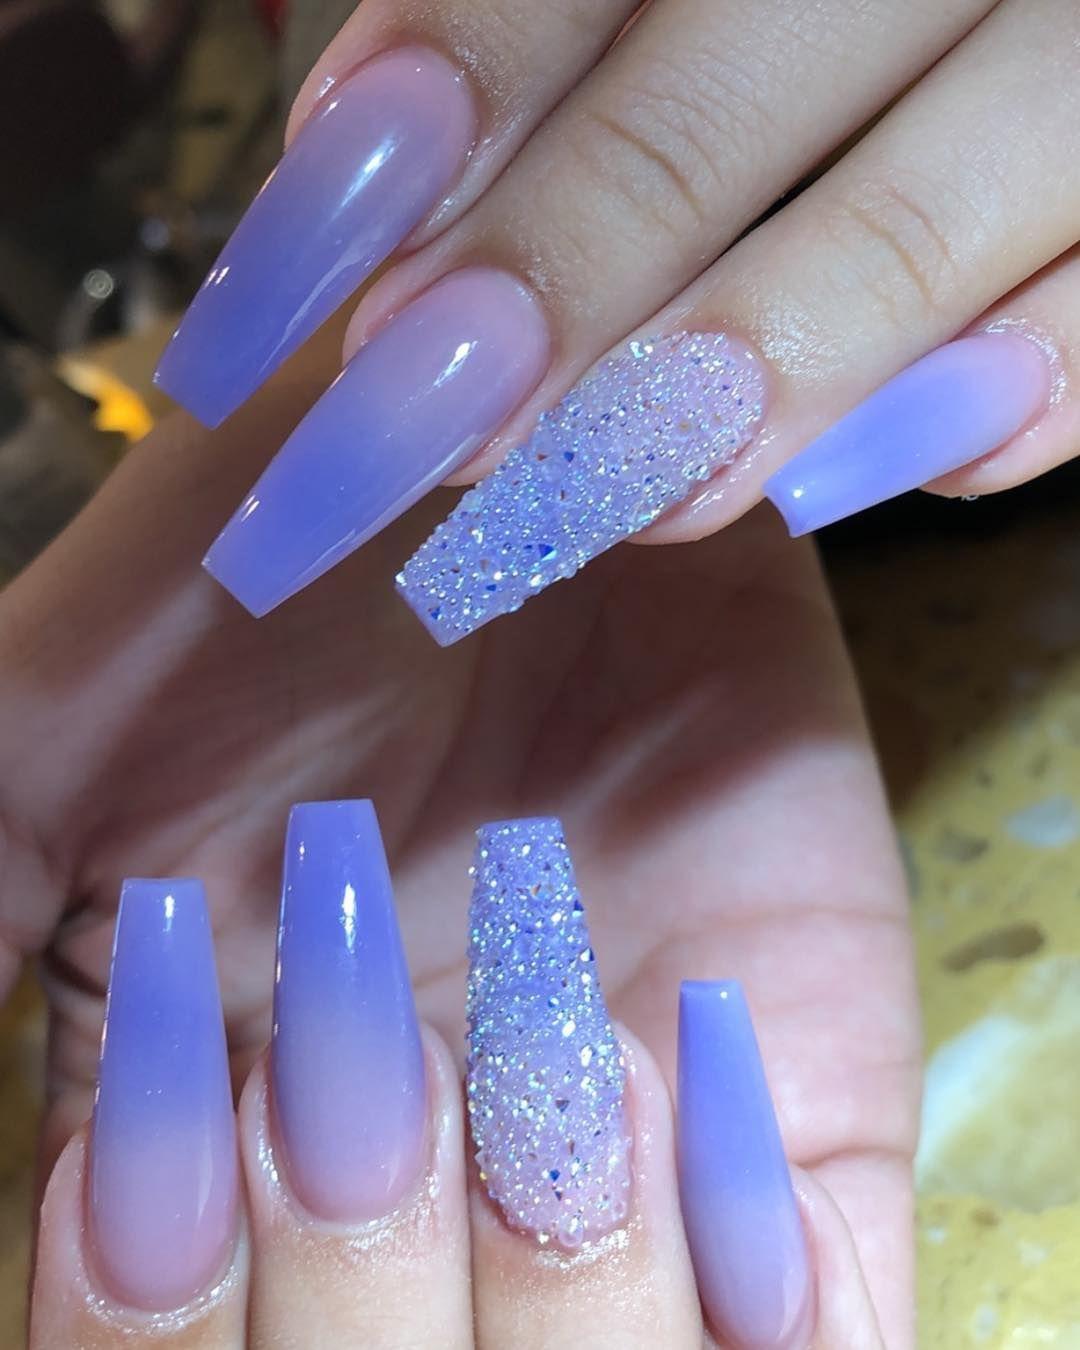 120 Best Coffin Nails Ideas That Suit Everyone Purple Glitter Nails Purple Ombre Nails Coffin Nails Designs